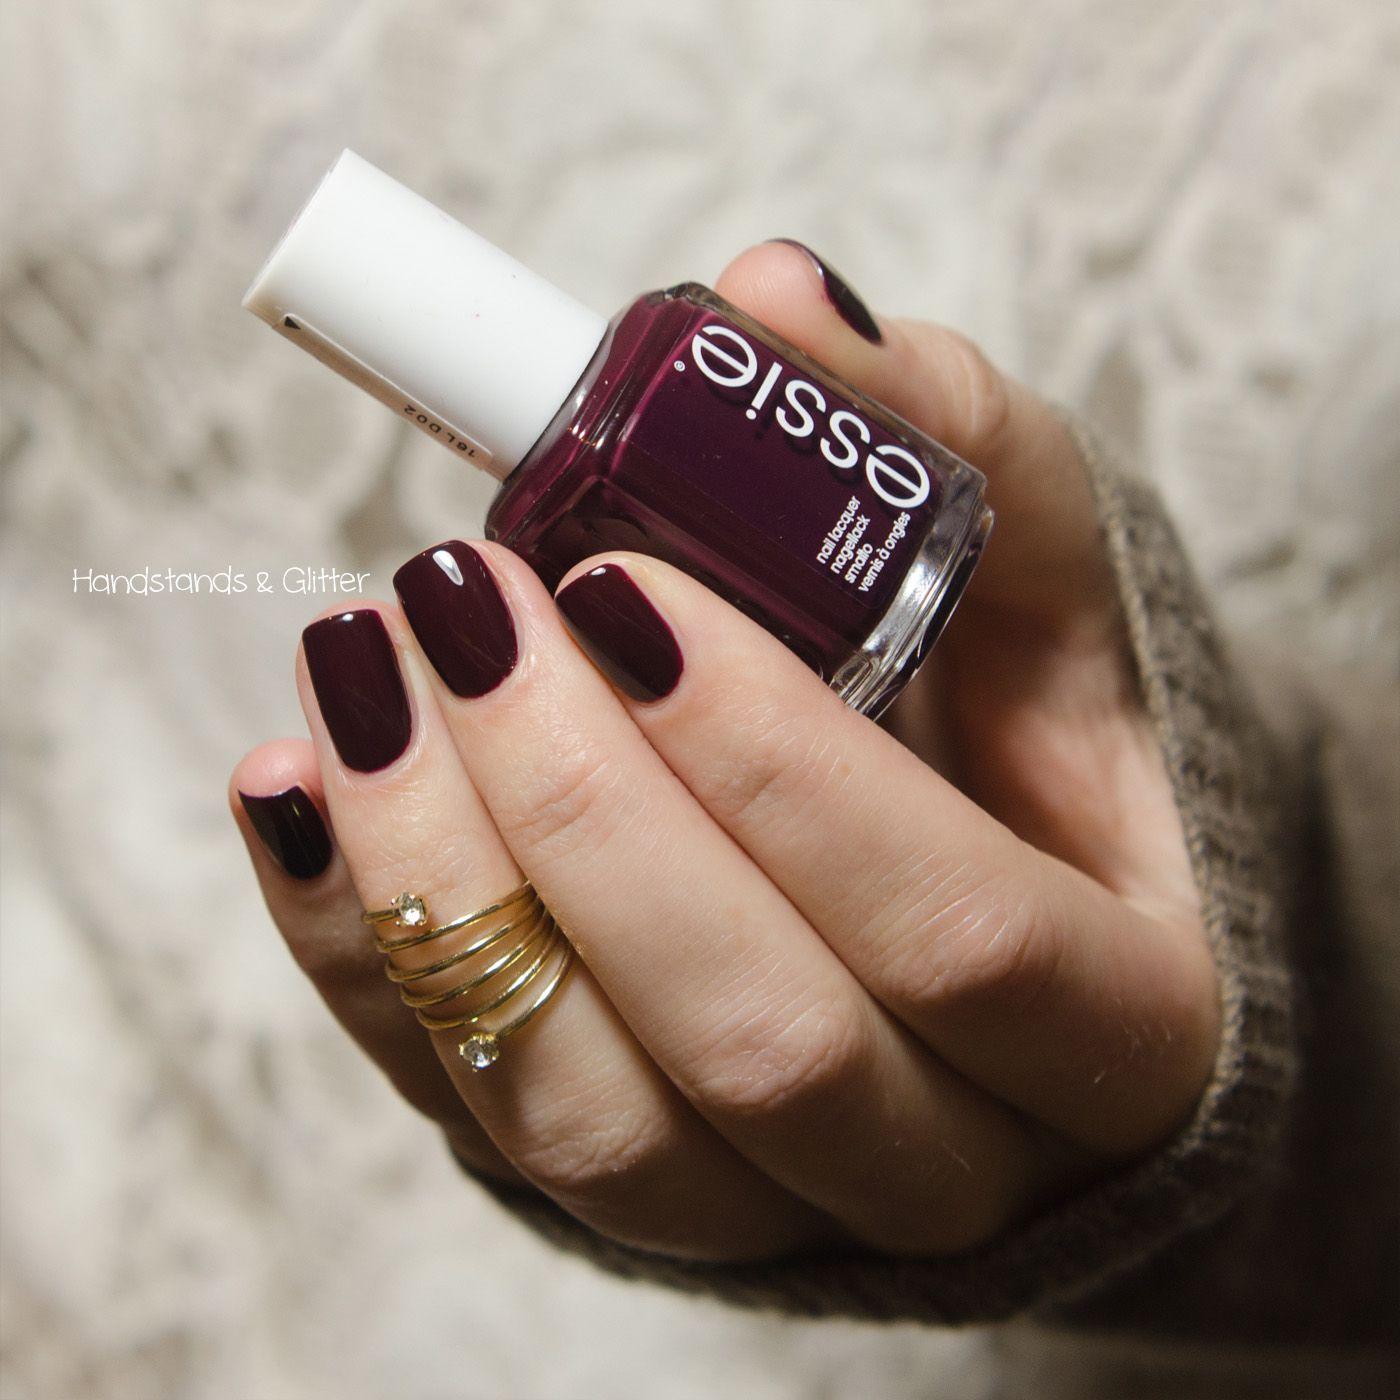 handstands & glitter: [Lieblingslacke] Essie - Sole Mate | Nails ...